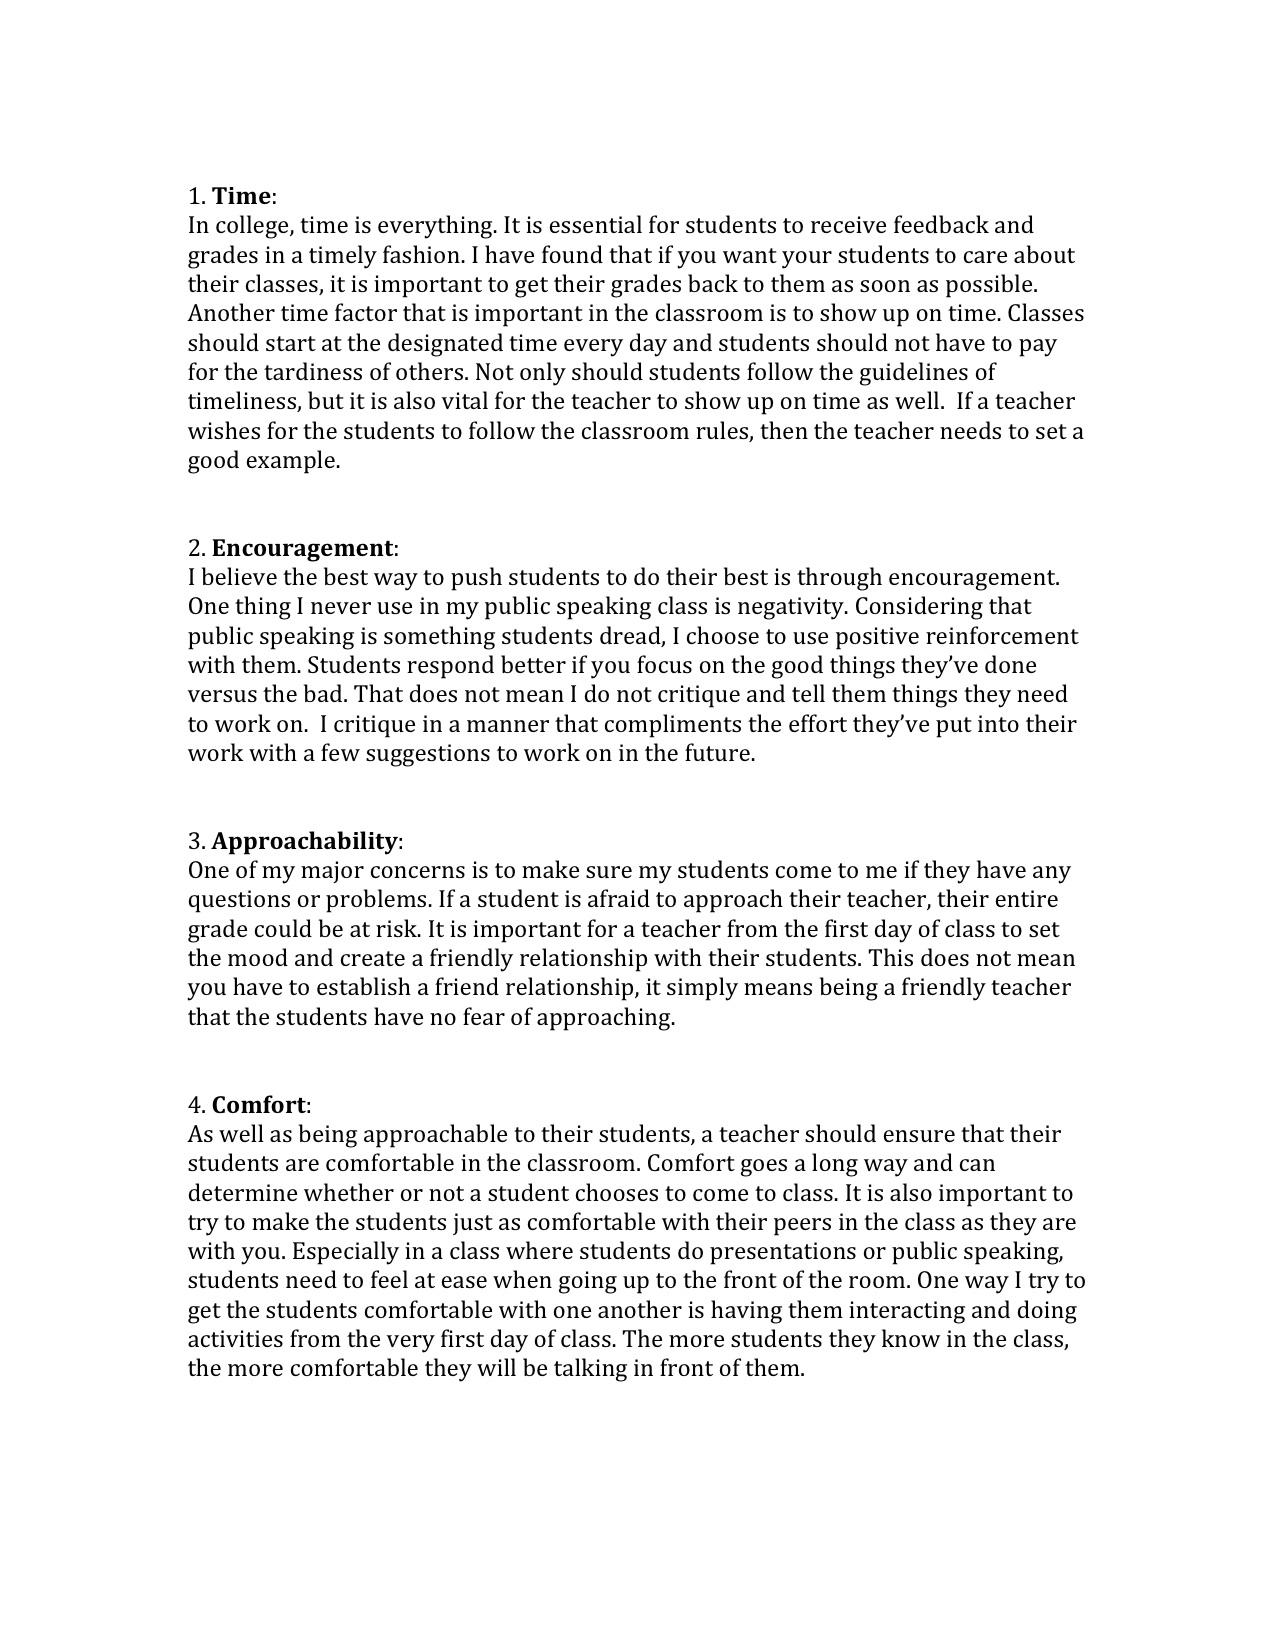 Custom philosophy essay